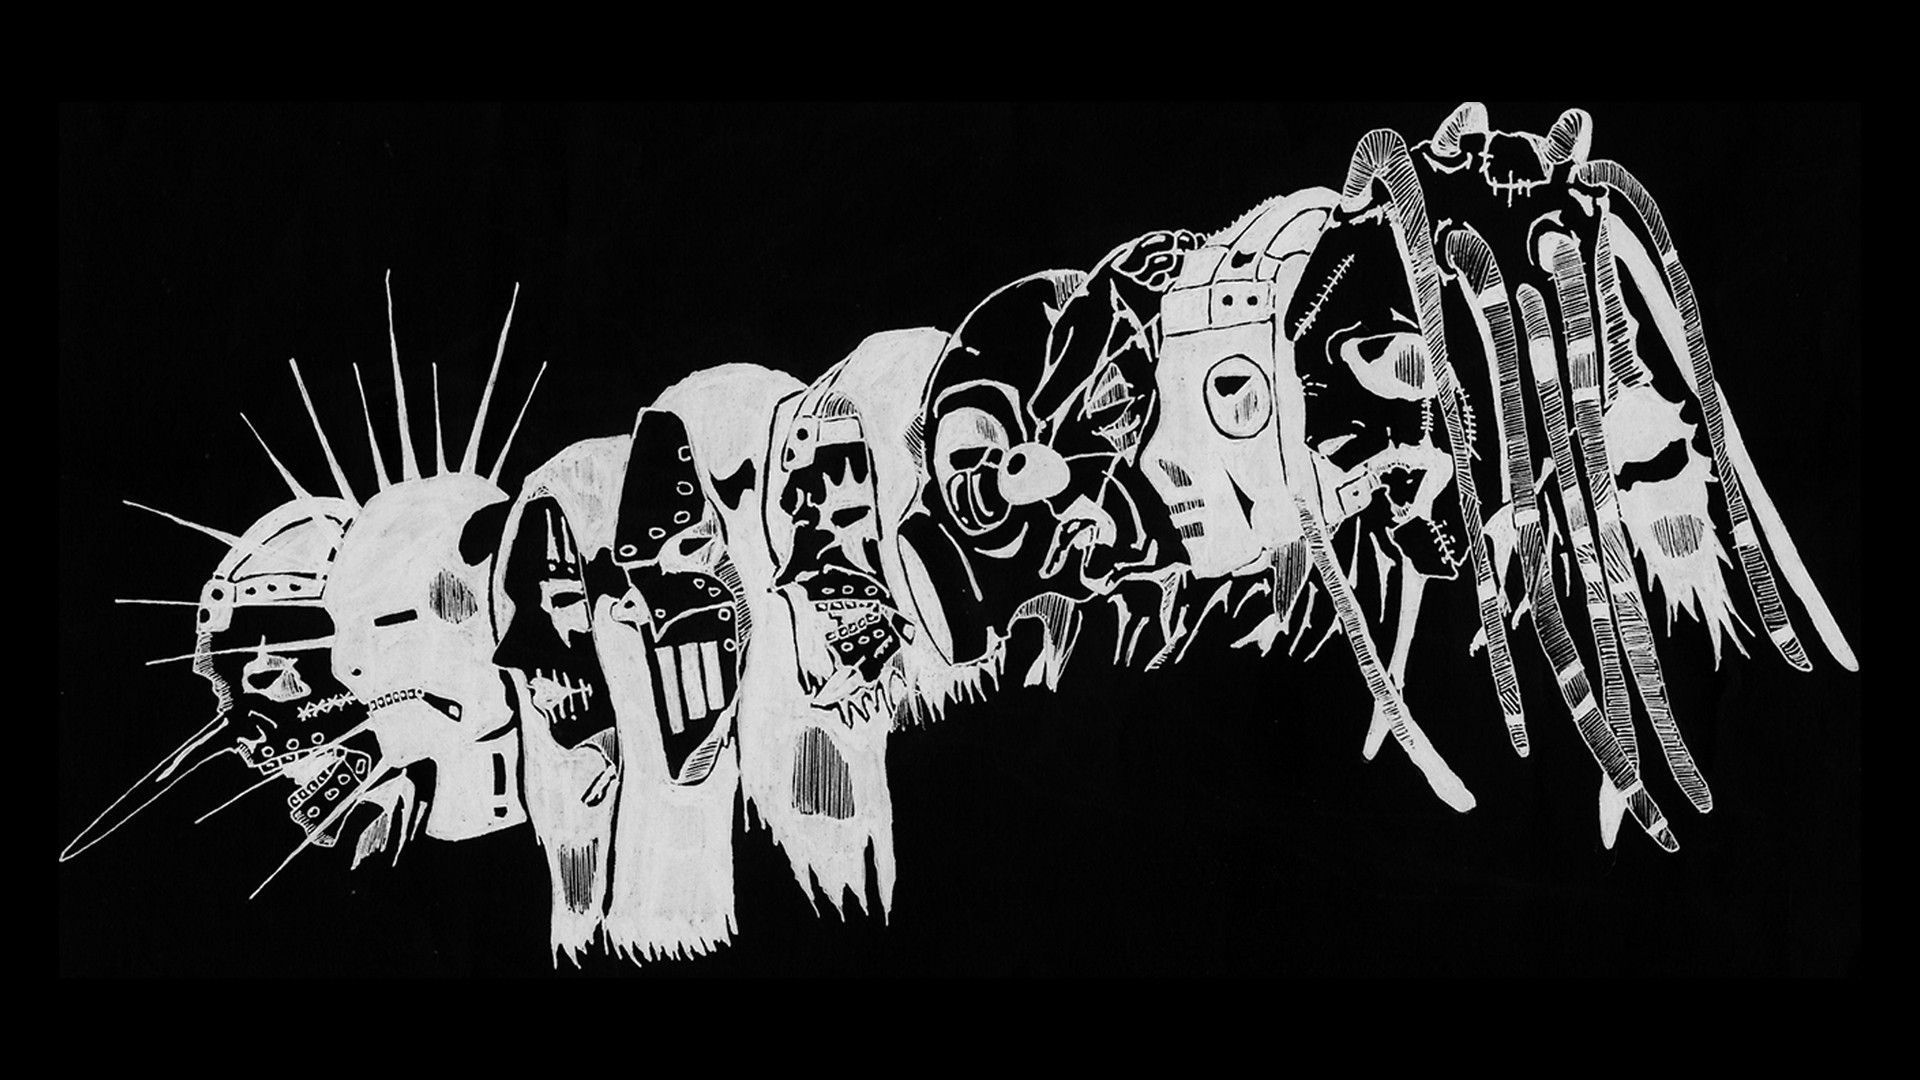 Music Heavy Metal slipknot band Corey Taylor wallpaper 1920x1080 1920x1080